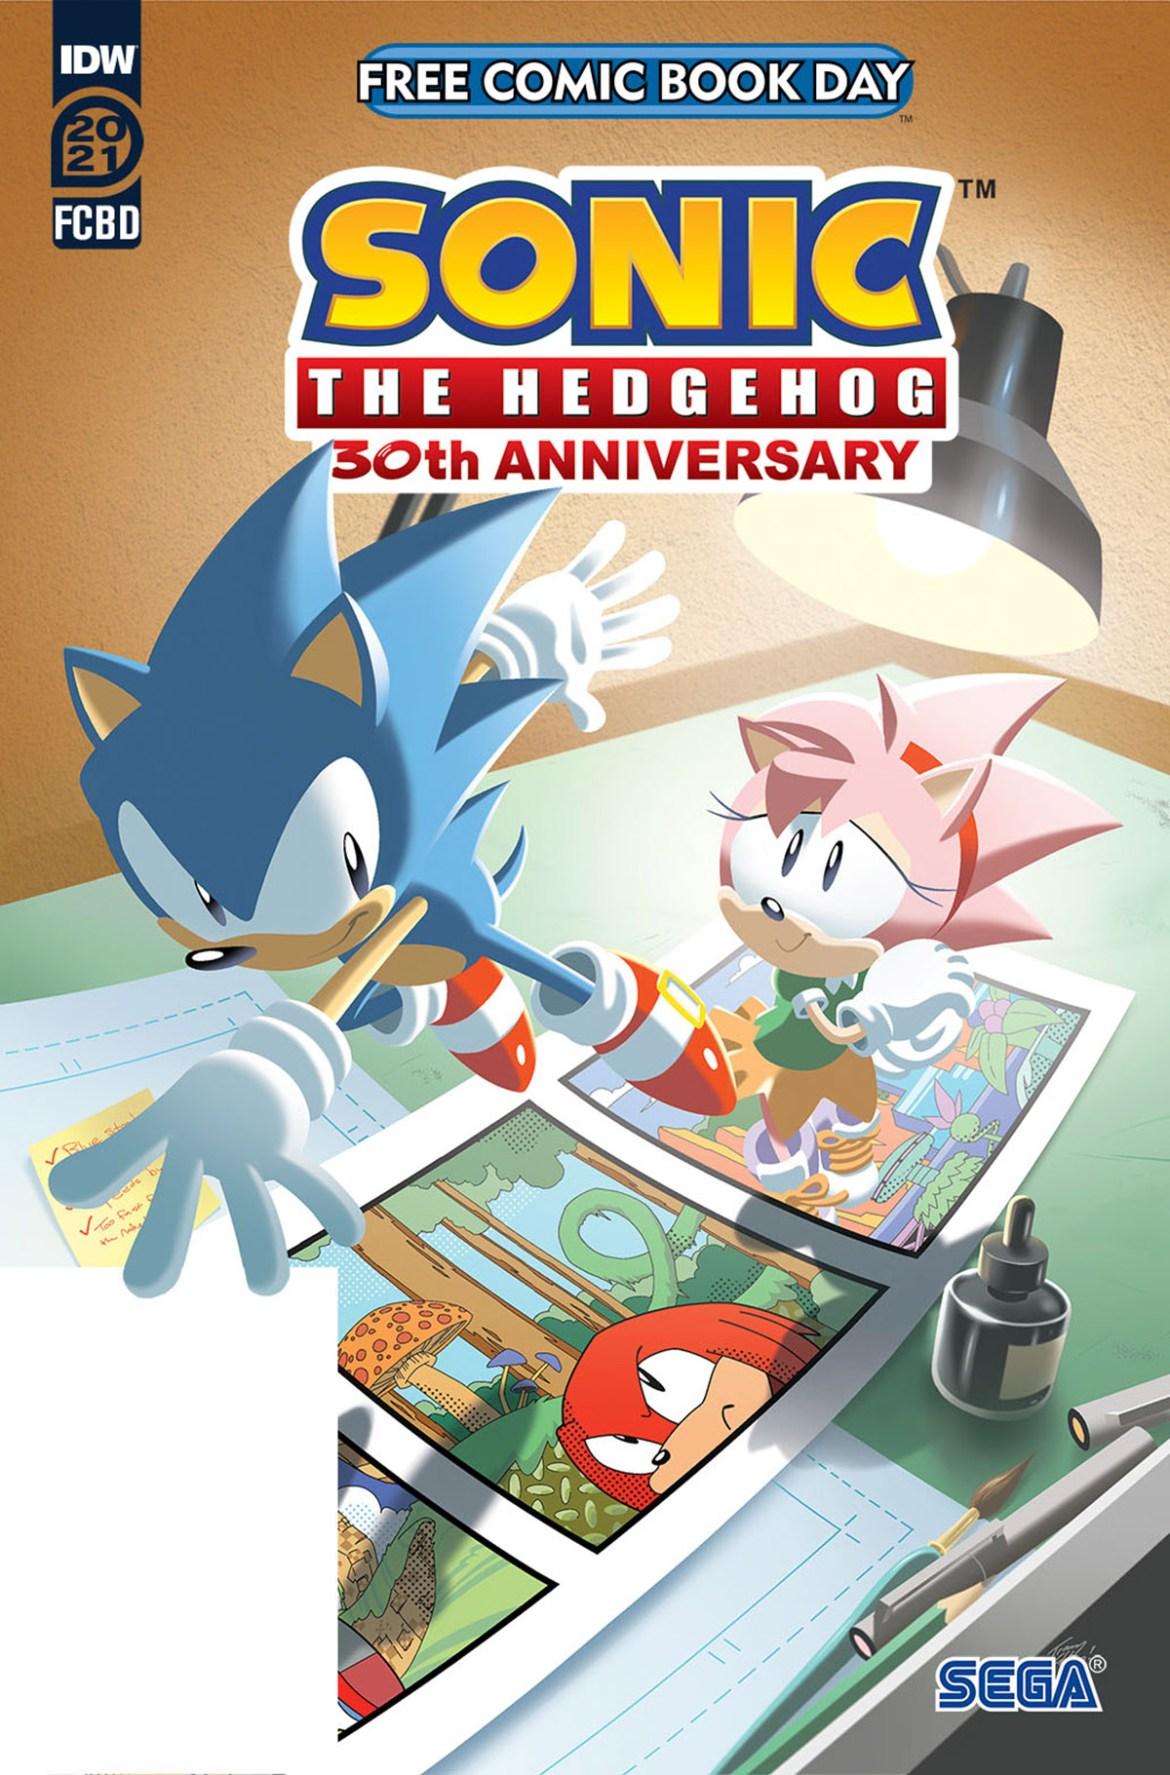 FCBD21_SILVER_IDW_Sonic-30th-Anniversary Complete Free Comic Book Day 2021 comic book line-up announced